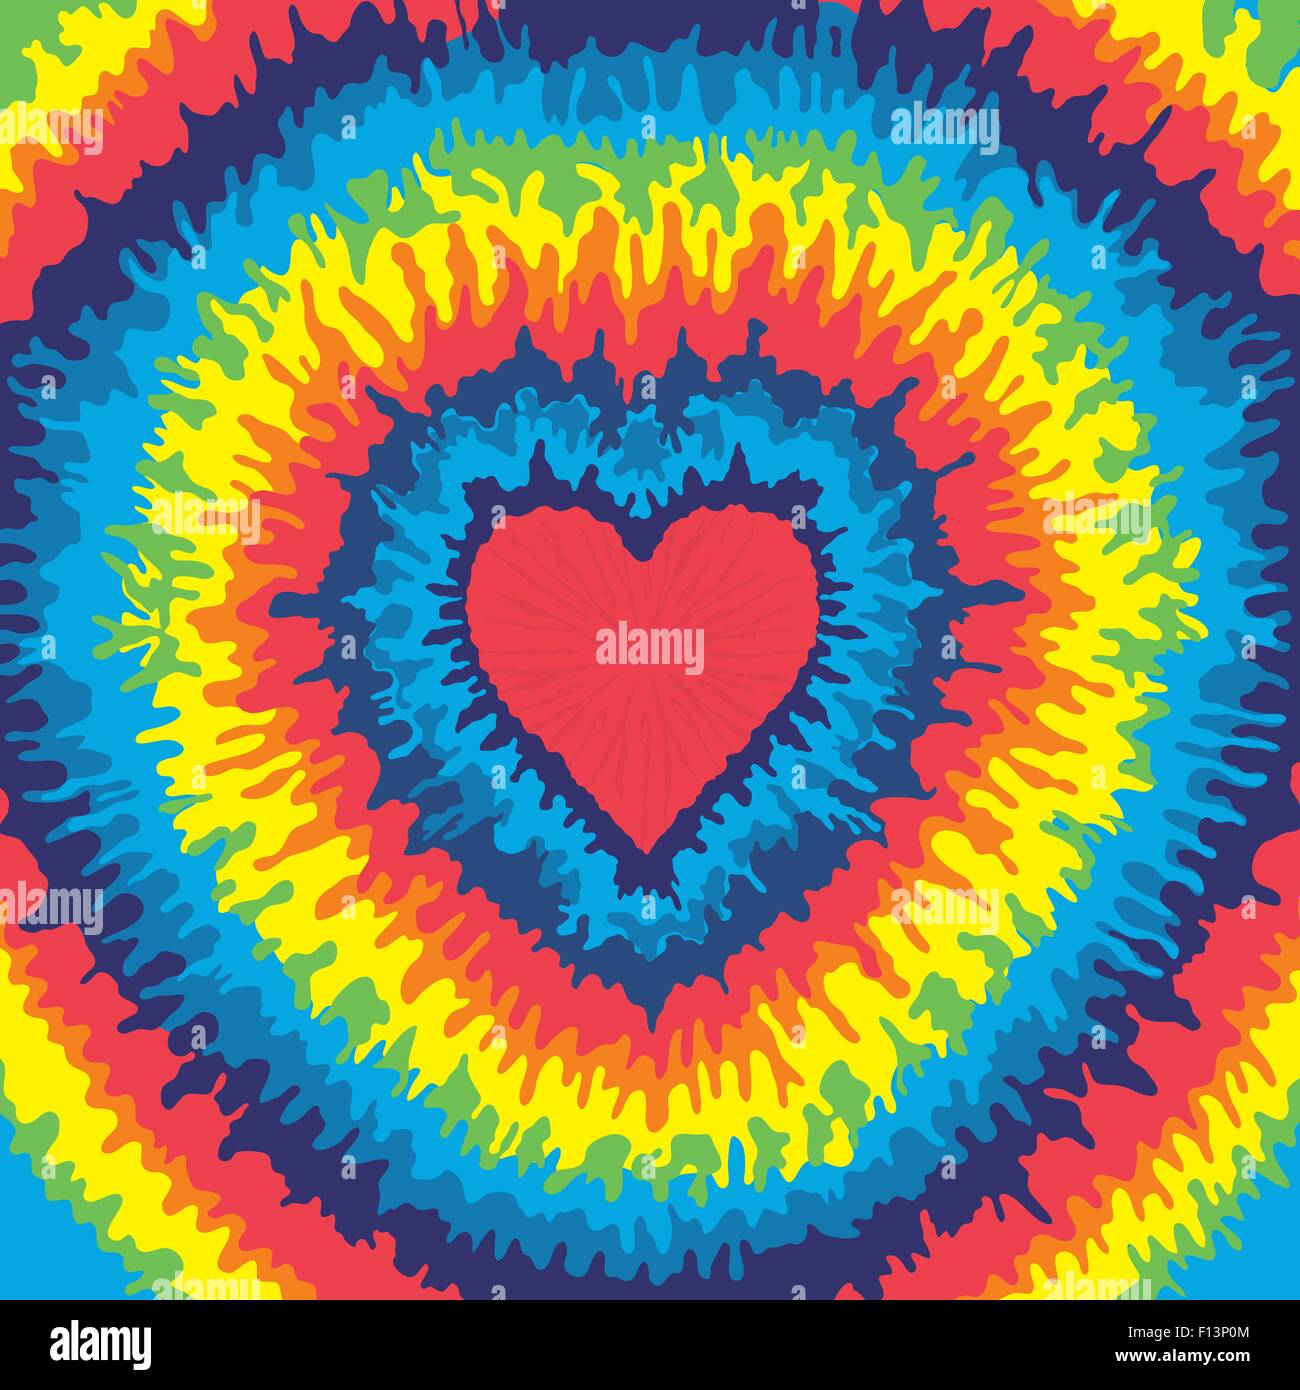 5843a981c Heart, Love, Rainbow Tie Dye Background Stock Vector Art ...